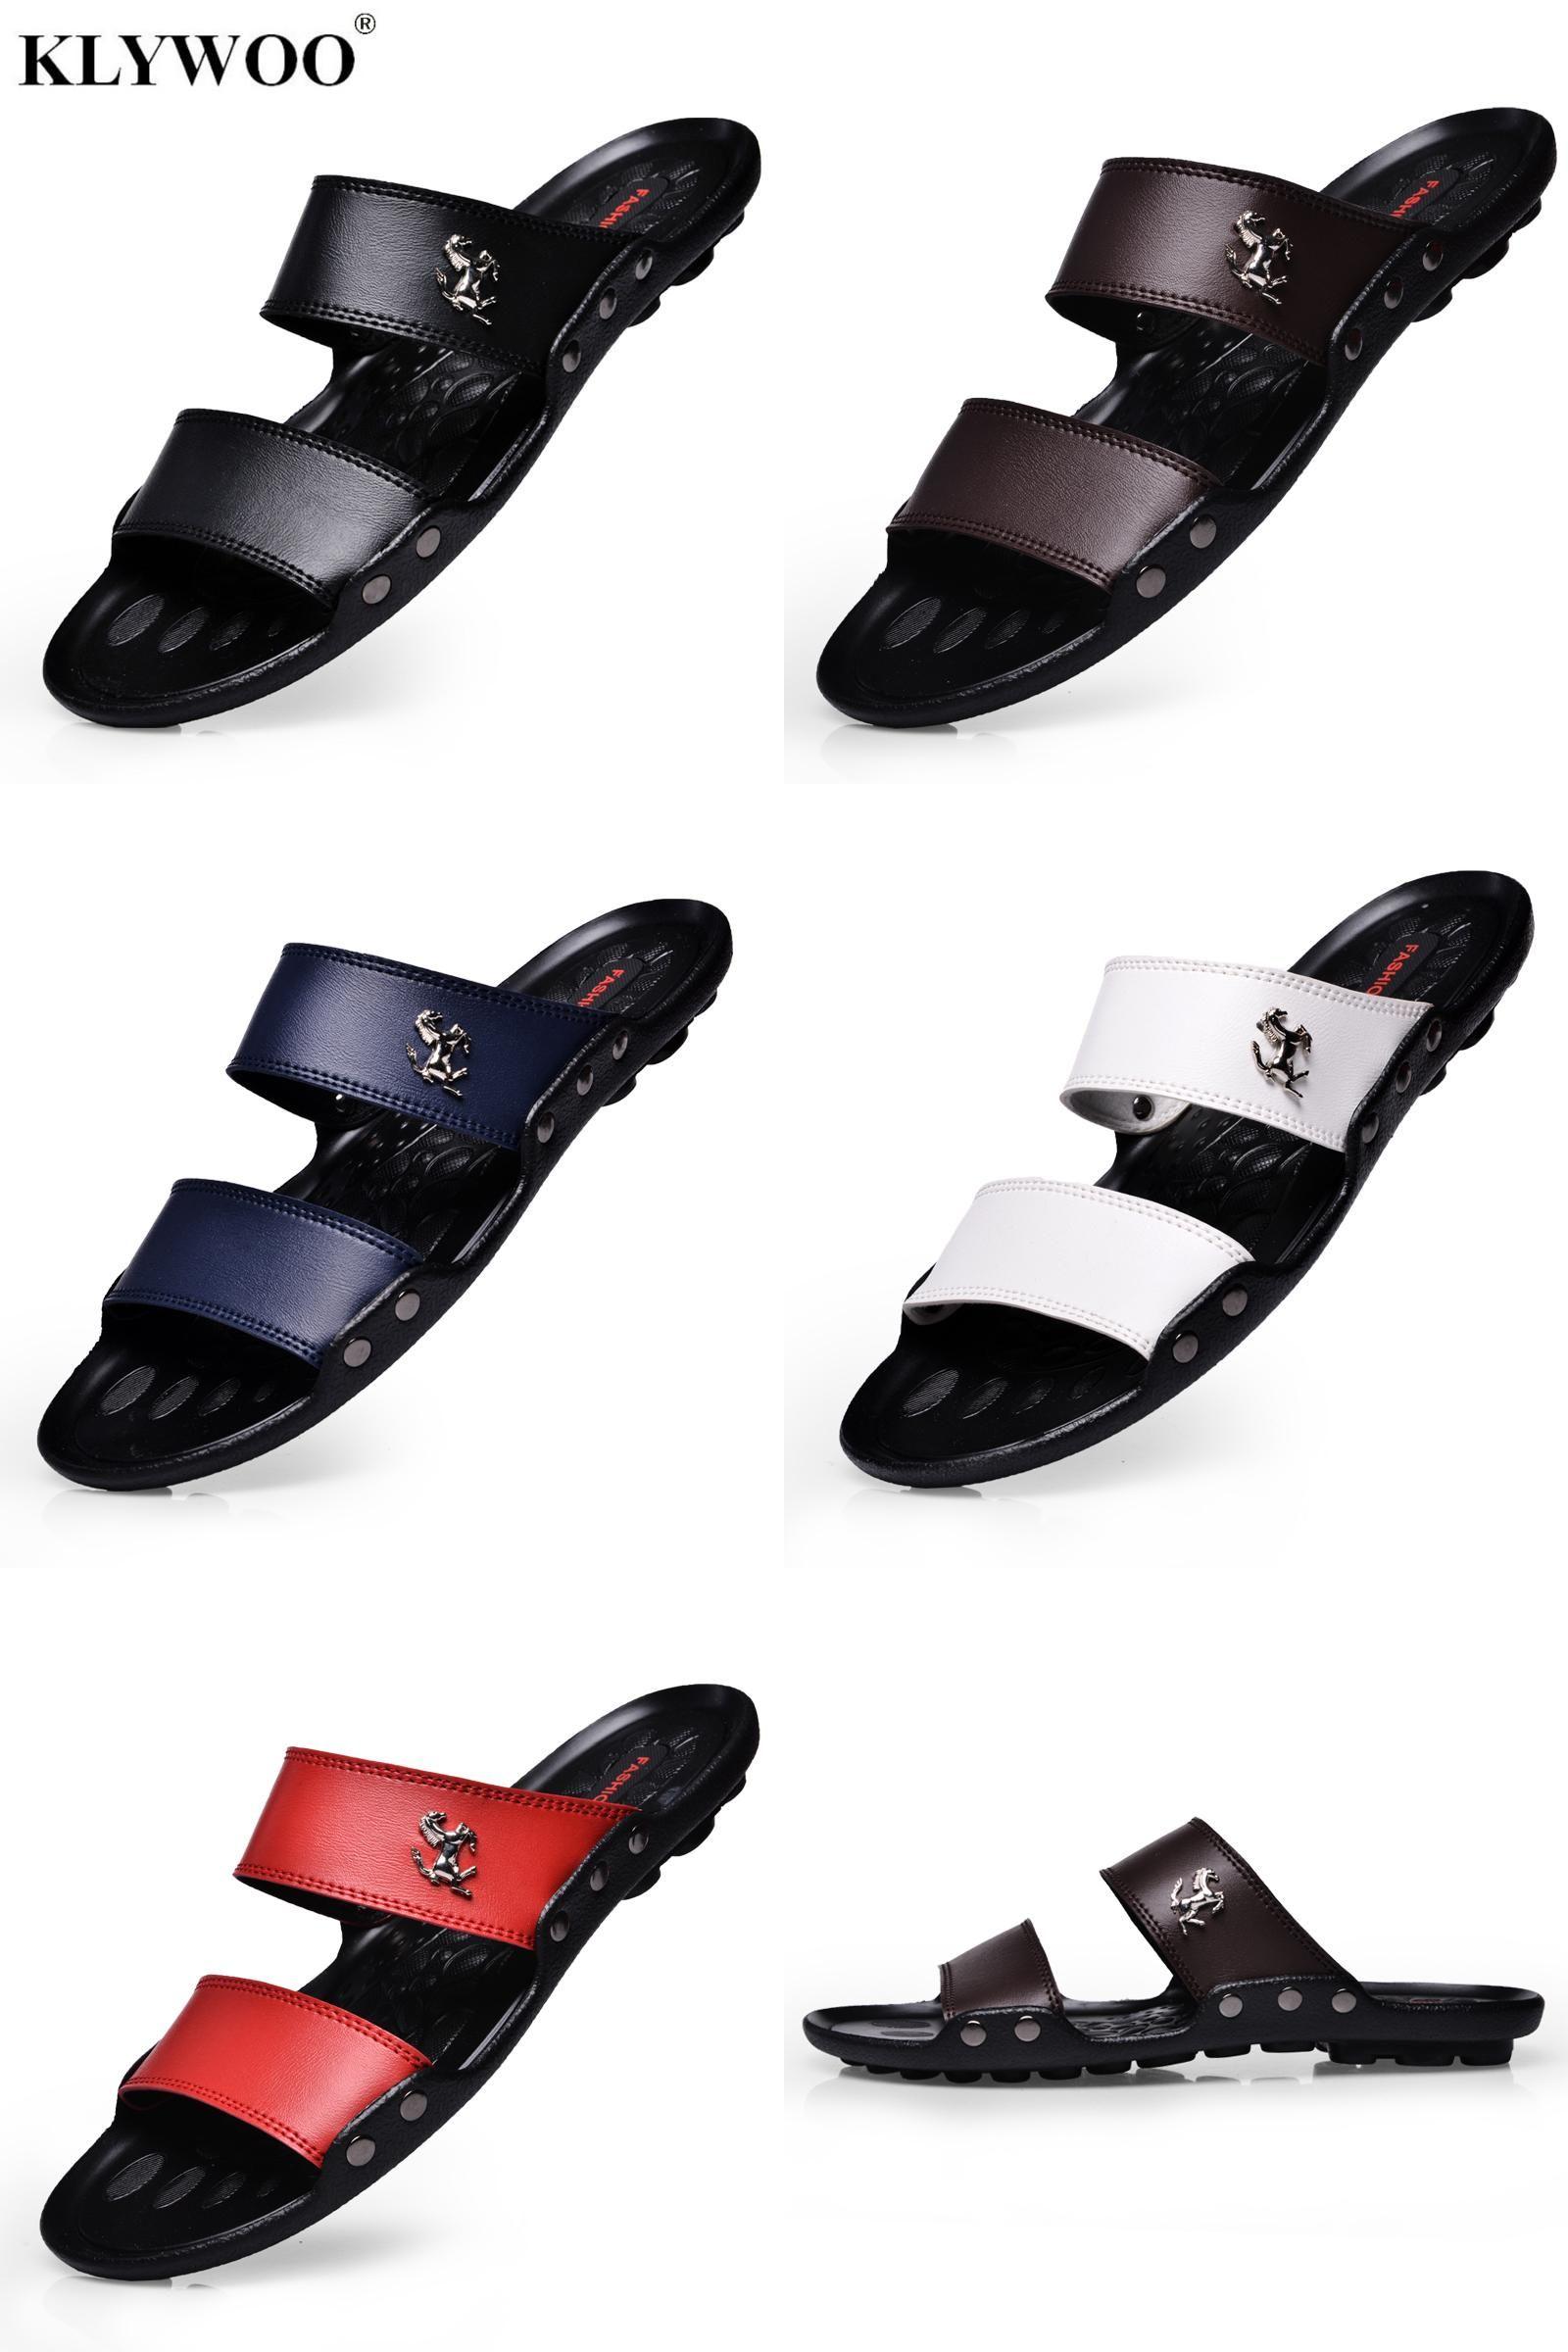 92bdf8d55323  Visit to Buy  Hot New Summer Fashion Shoes Men Flats Sandals Slides Beach  Flip